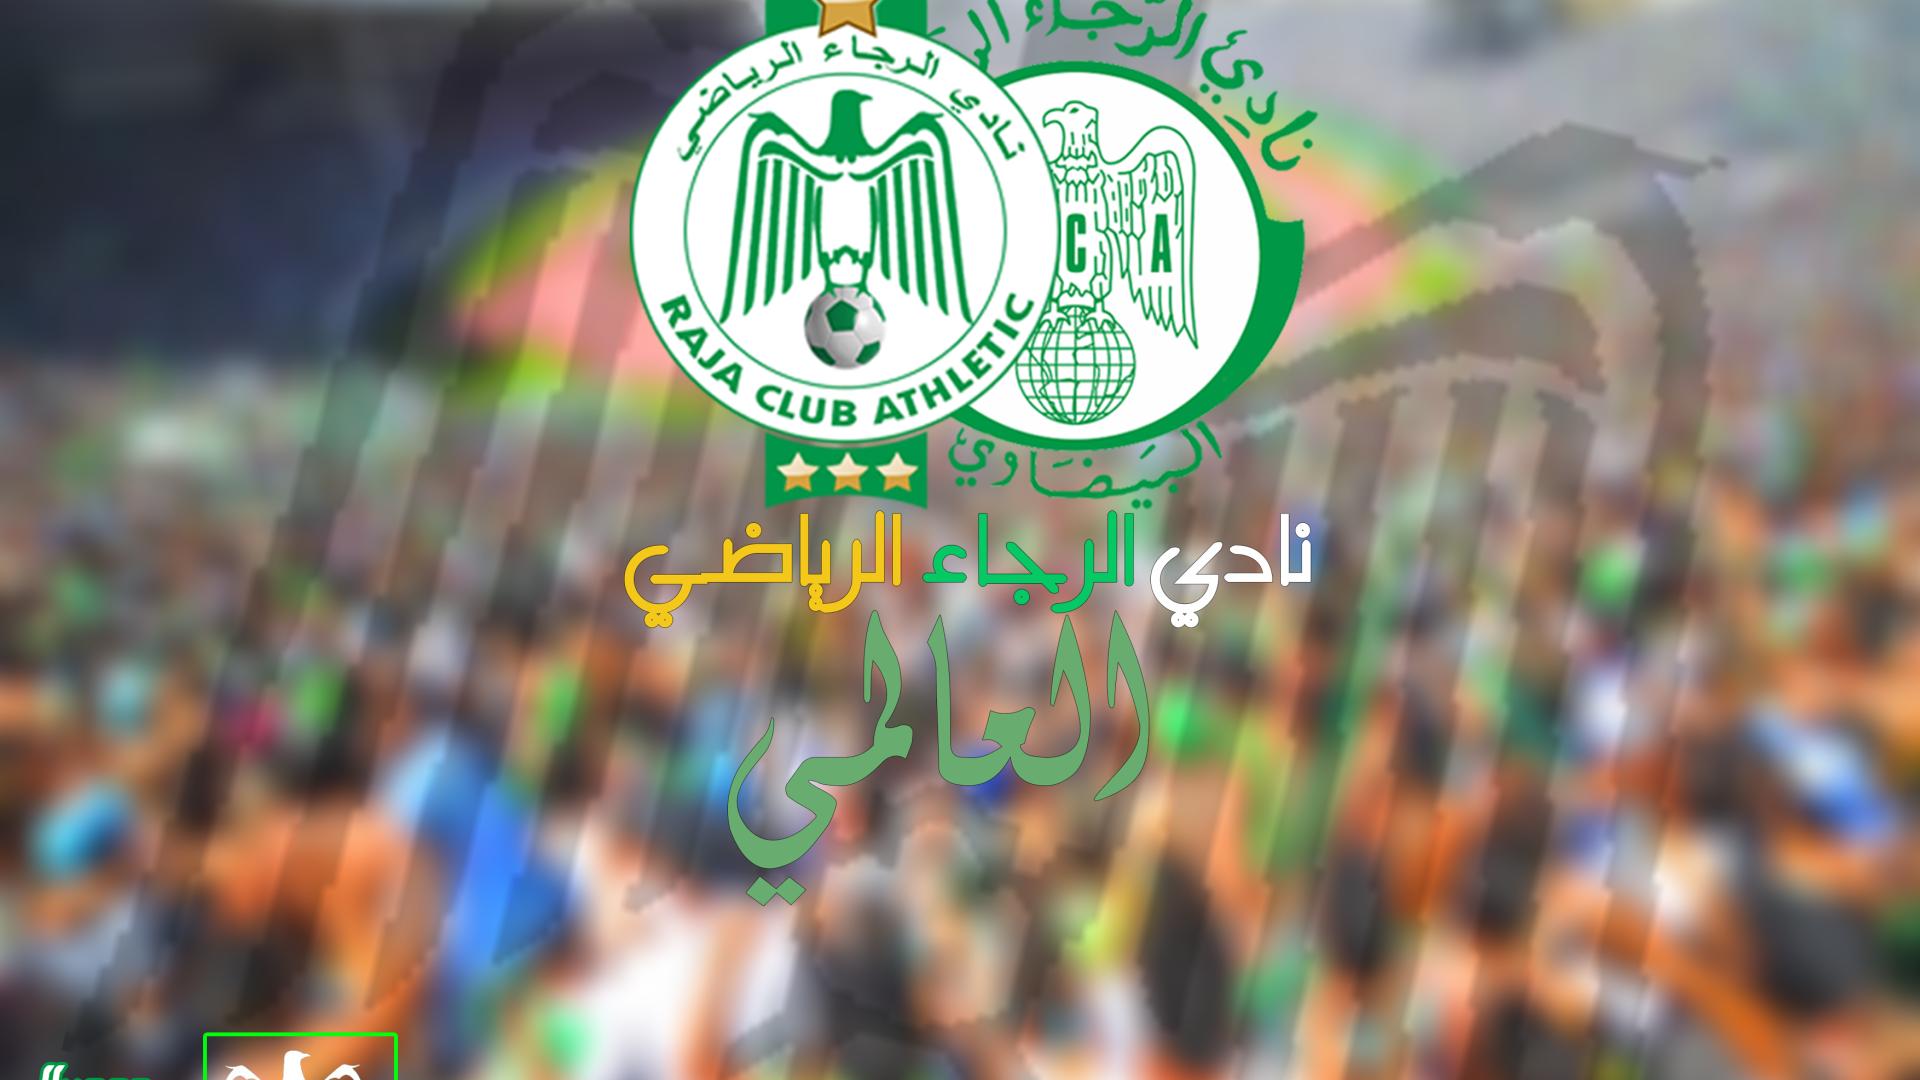 The Symbolism Of The Football Club Raja Casablanca Morocco